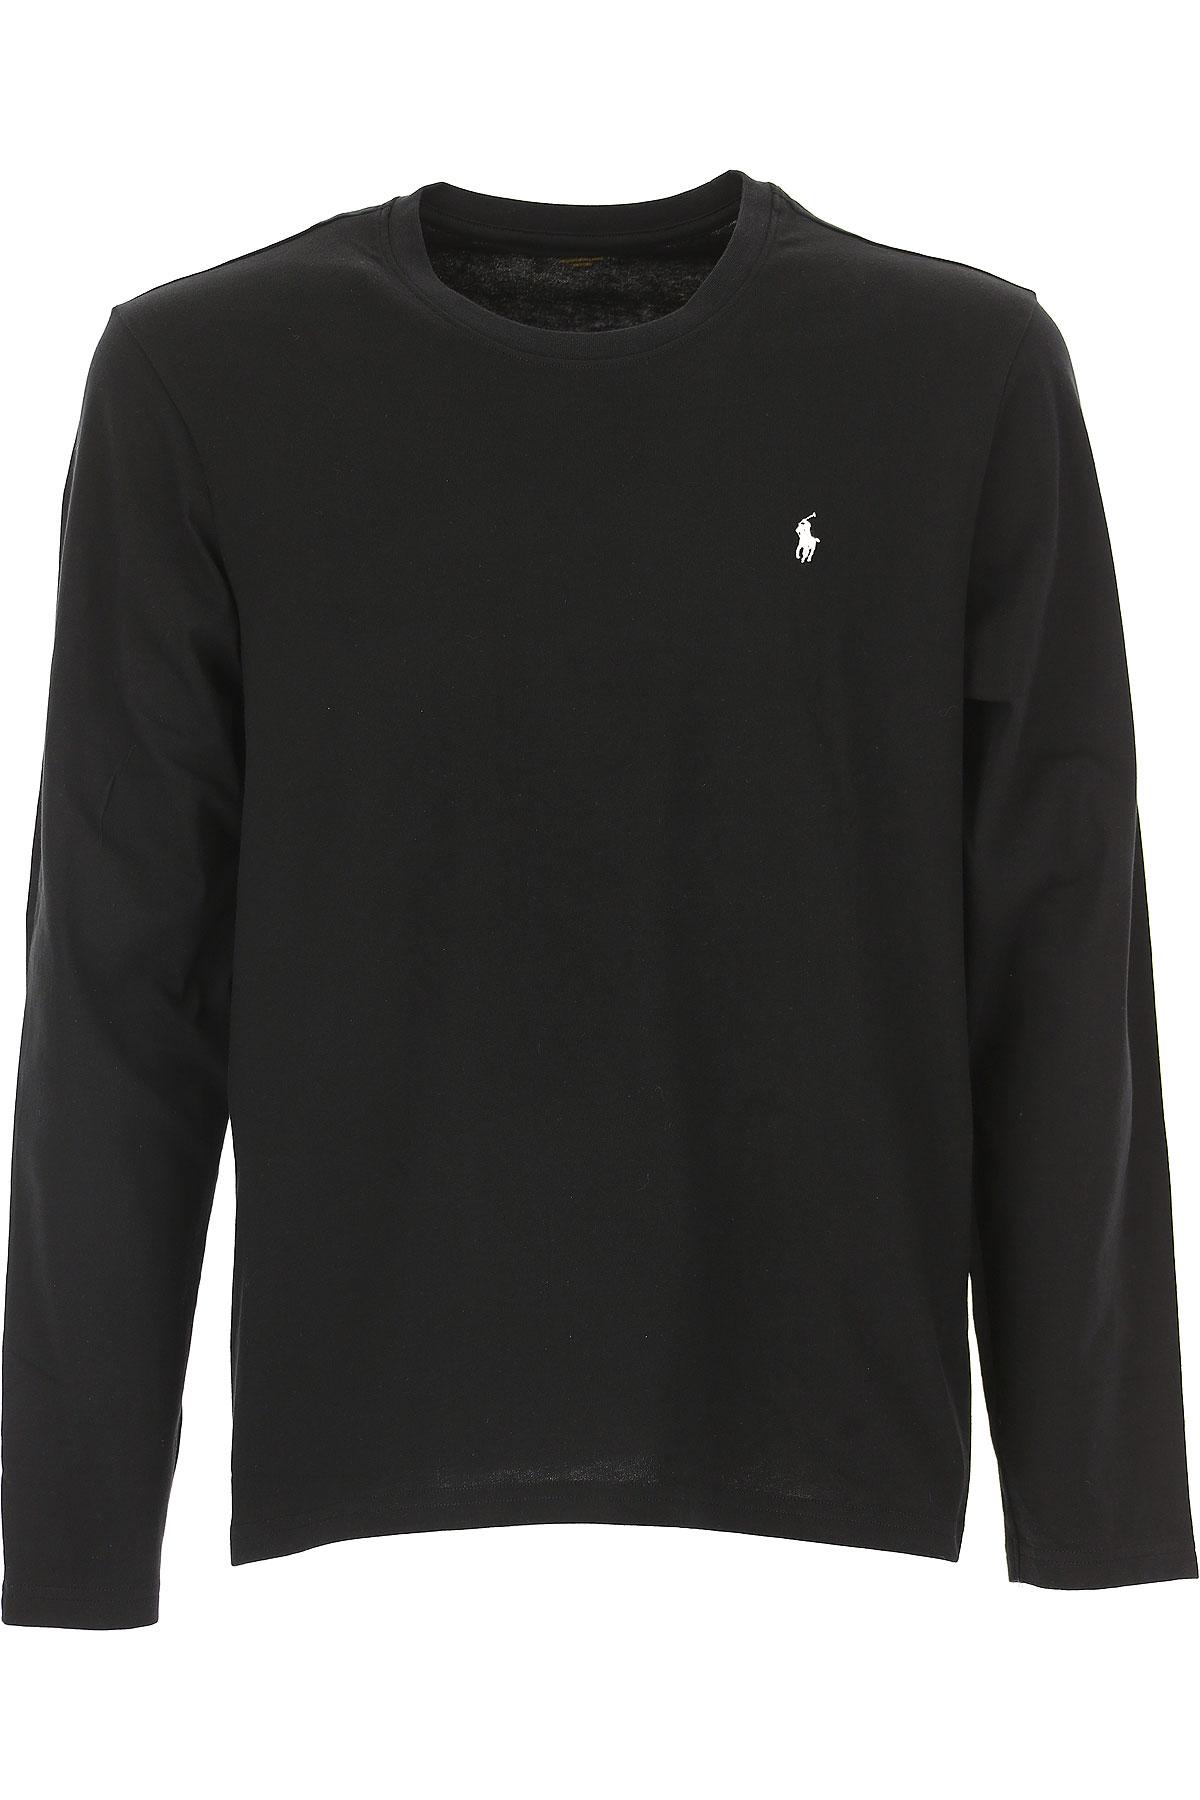 Ralph Lauren T-Shirt for Men, Black, Cotton, 2017, L M S XL XXL USA-438540